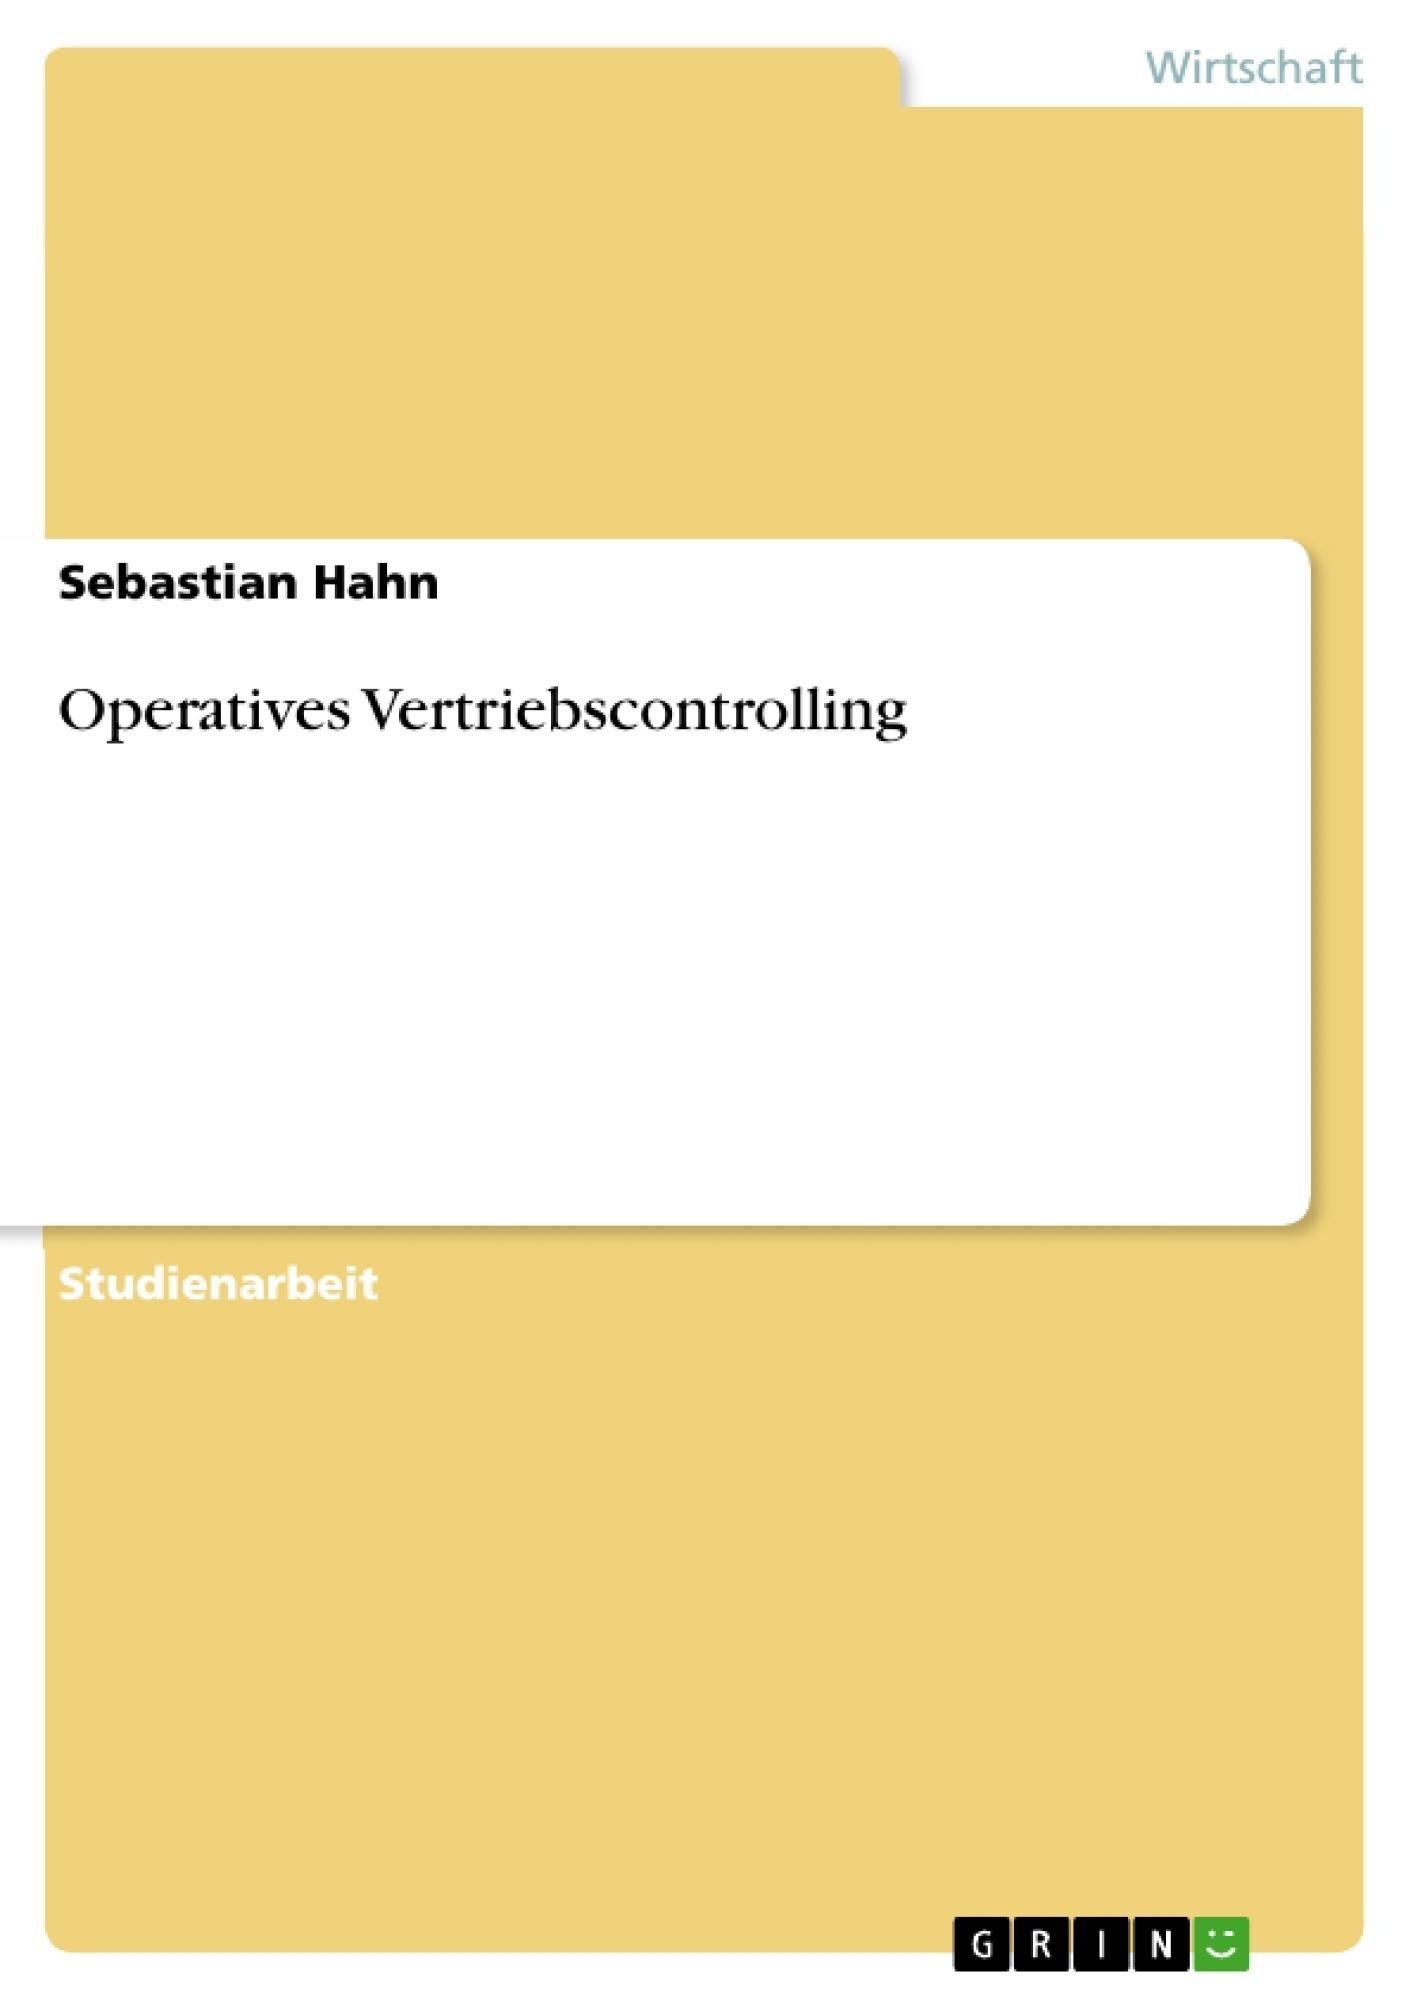 Titel: Operatives Vertriebscontrolling